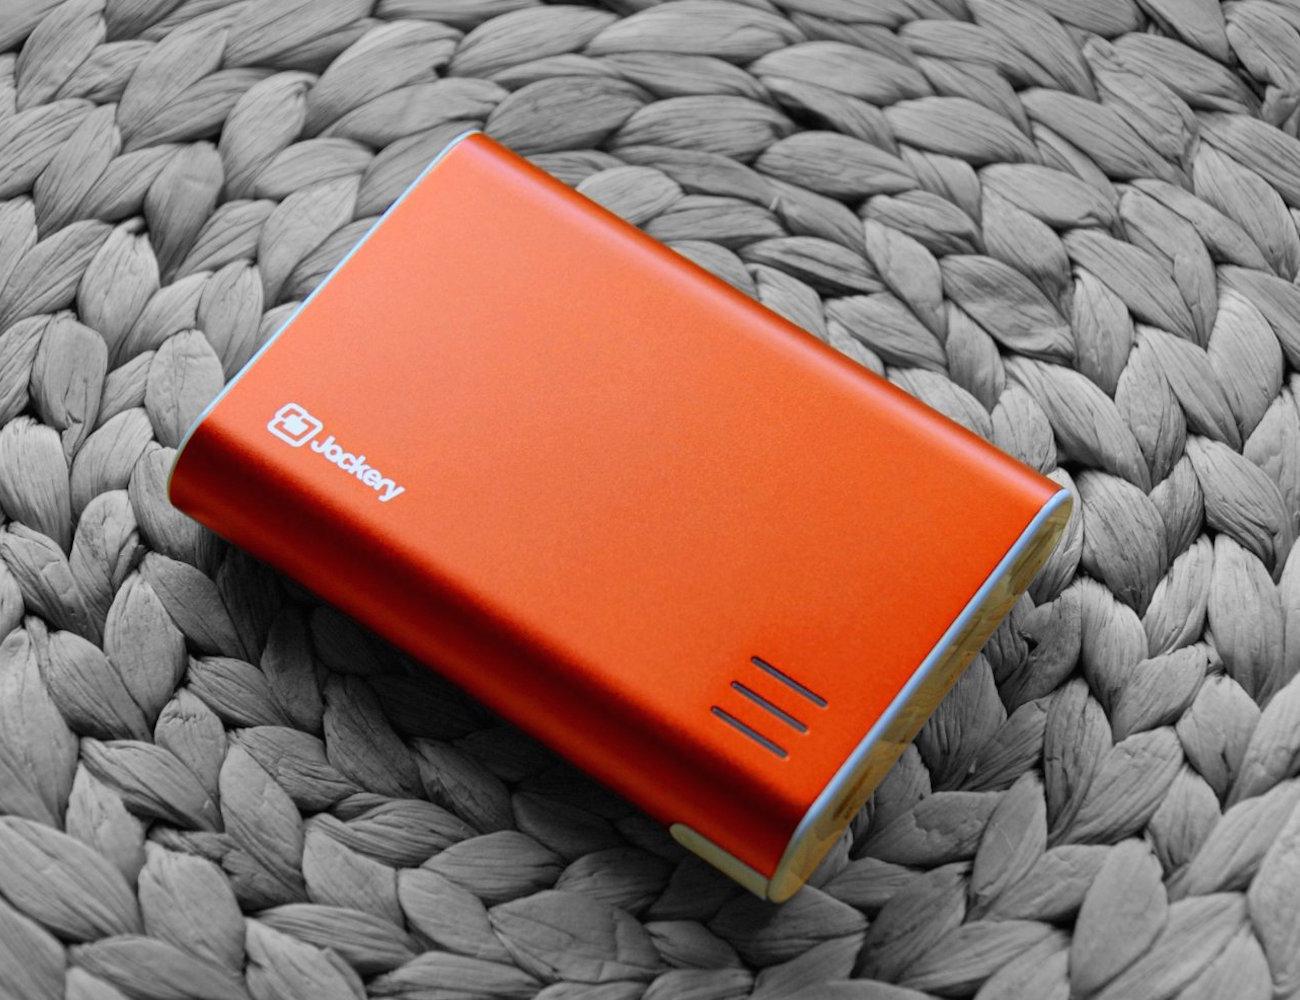 Jackery Giant+ 2-USB Portable External Battery Charger